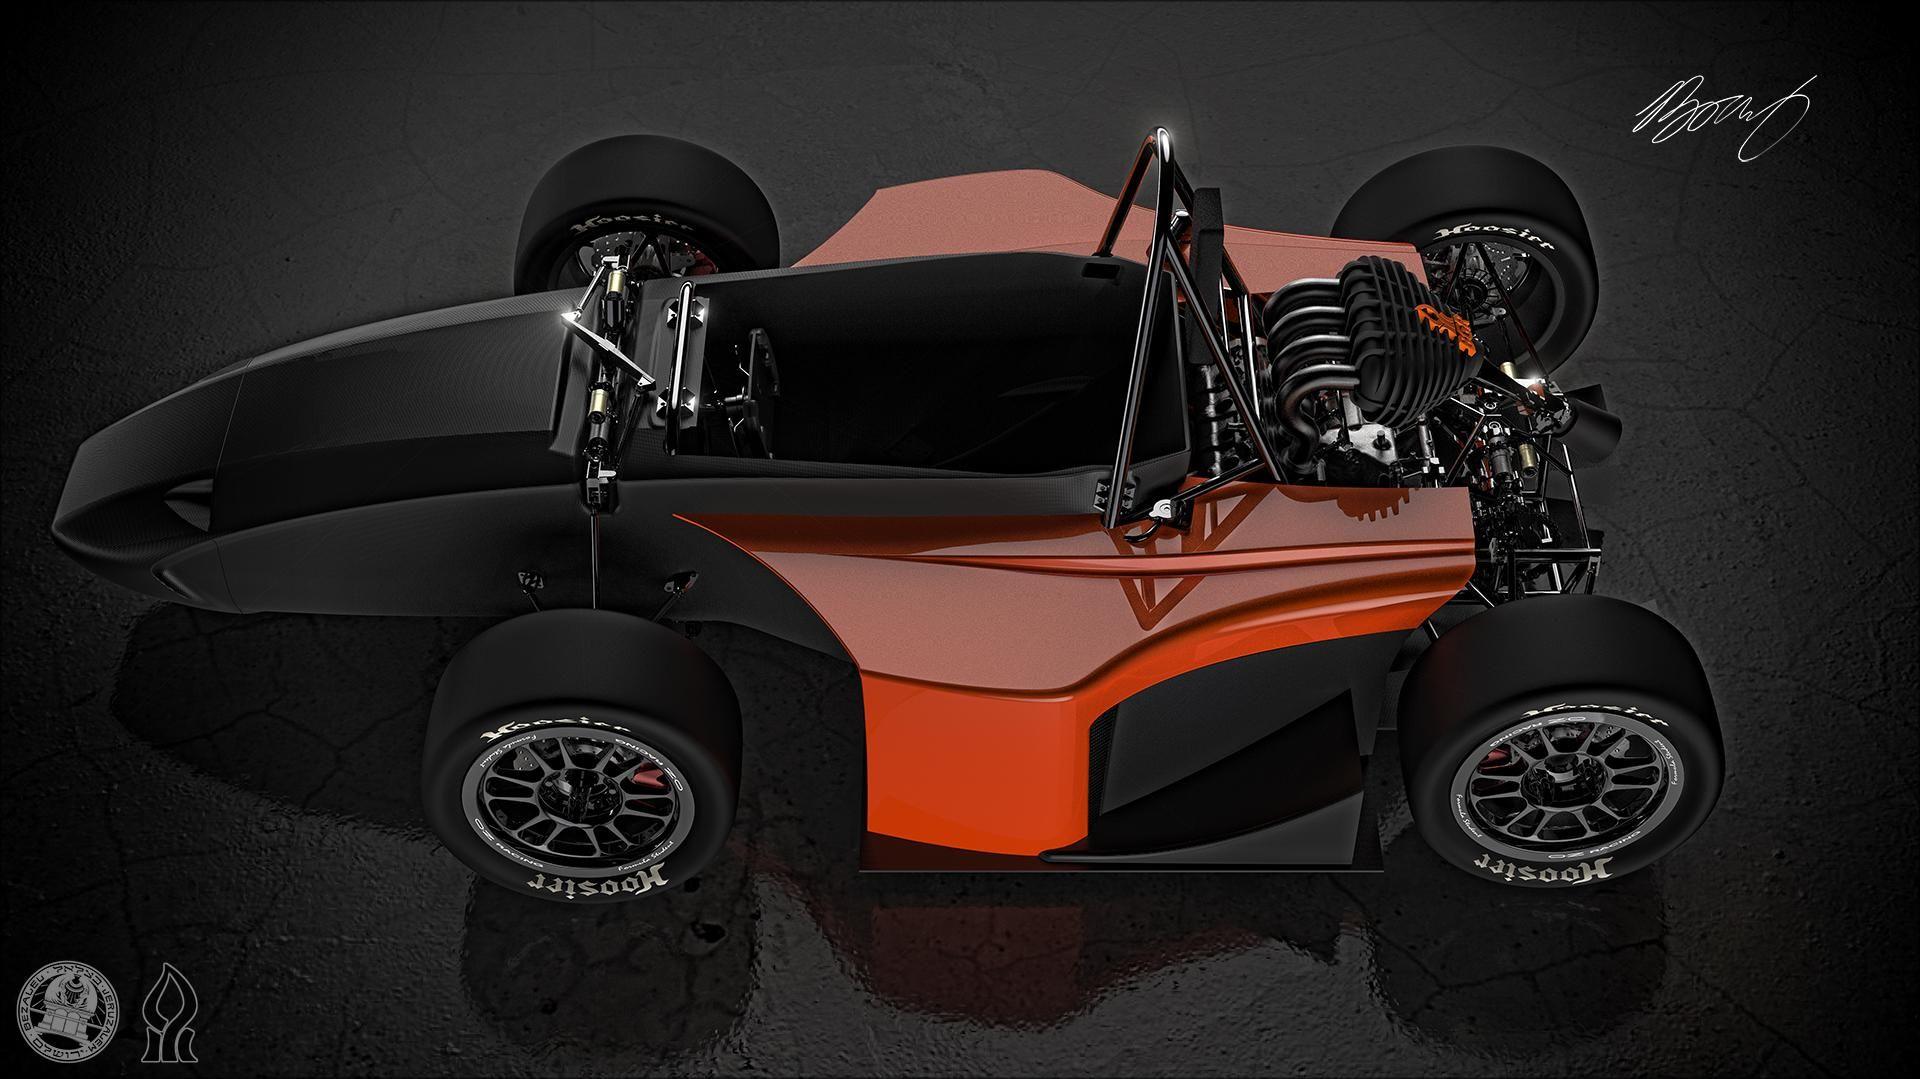 Formula SAE race car. The BGR 2014, modeled in SolidWorks